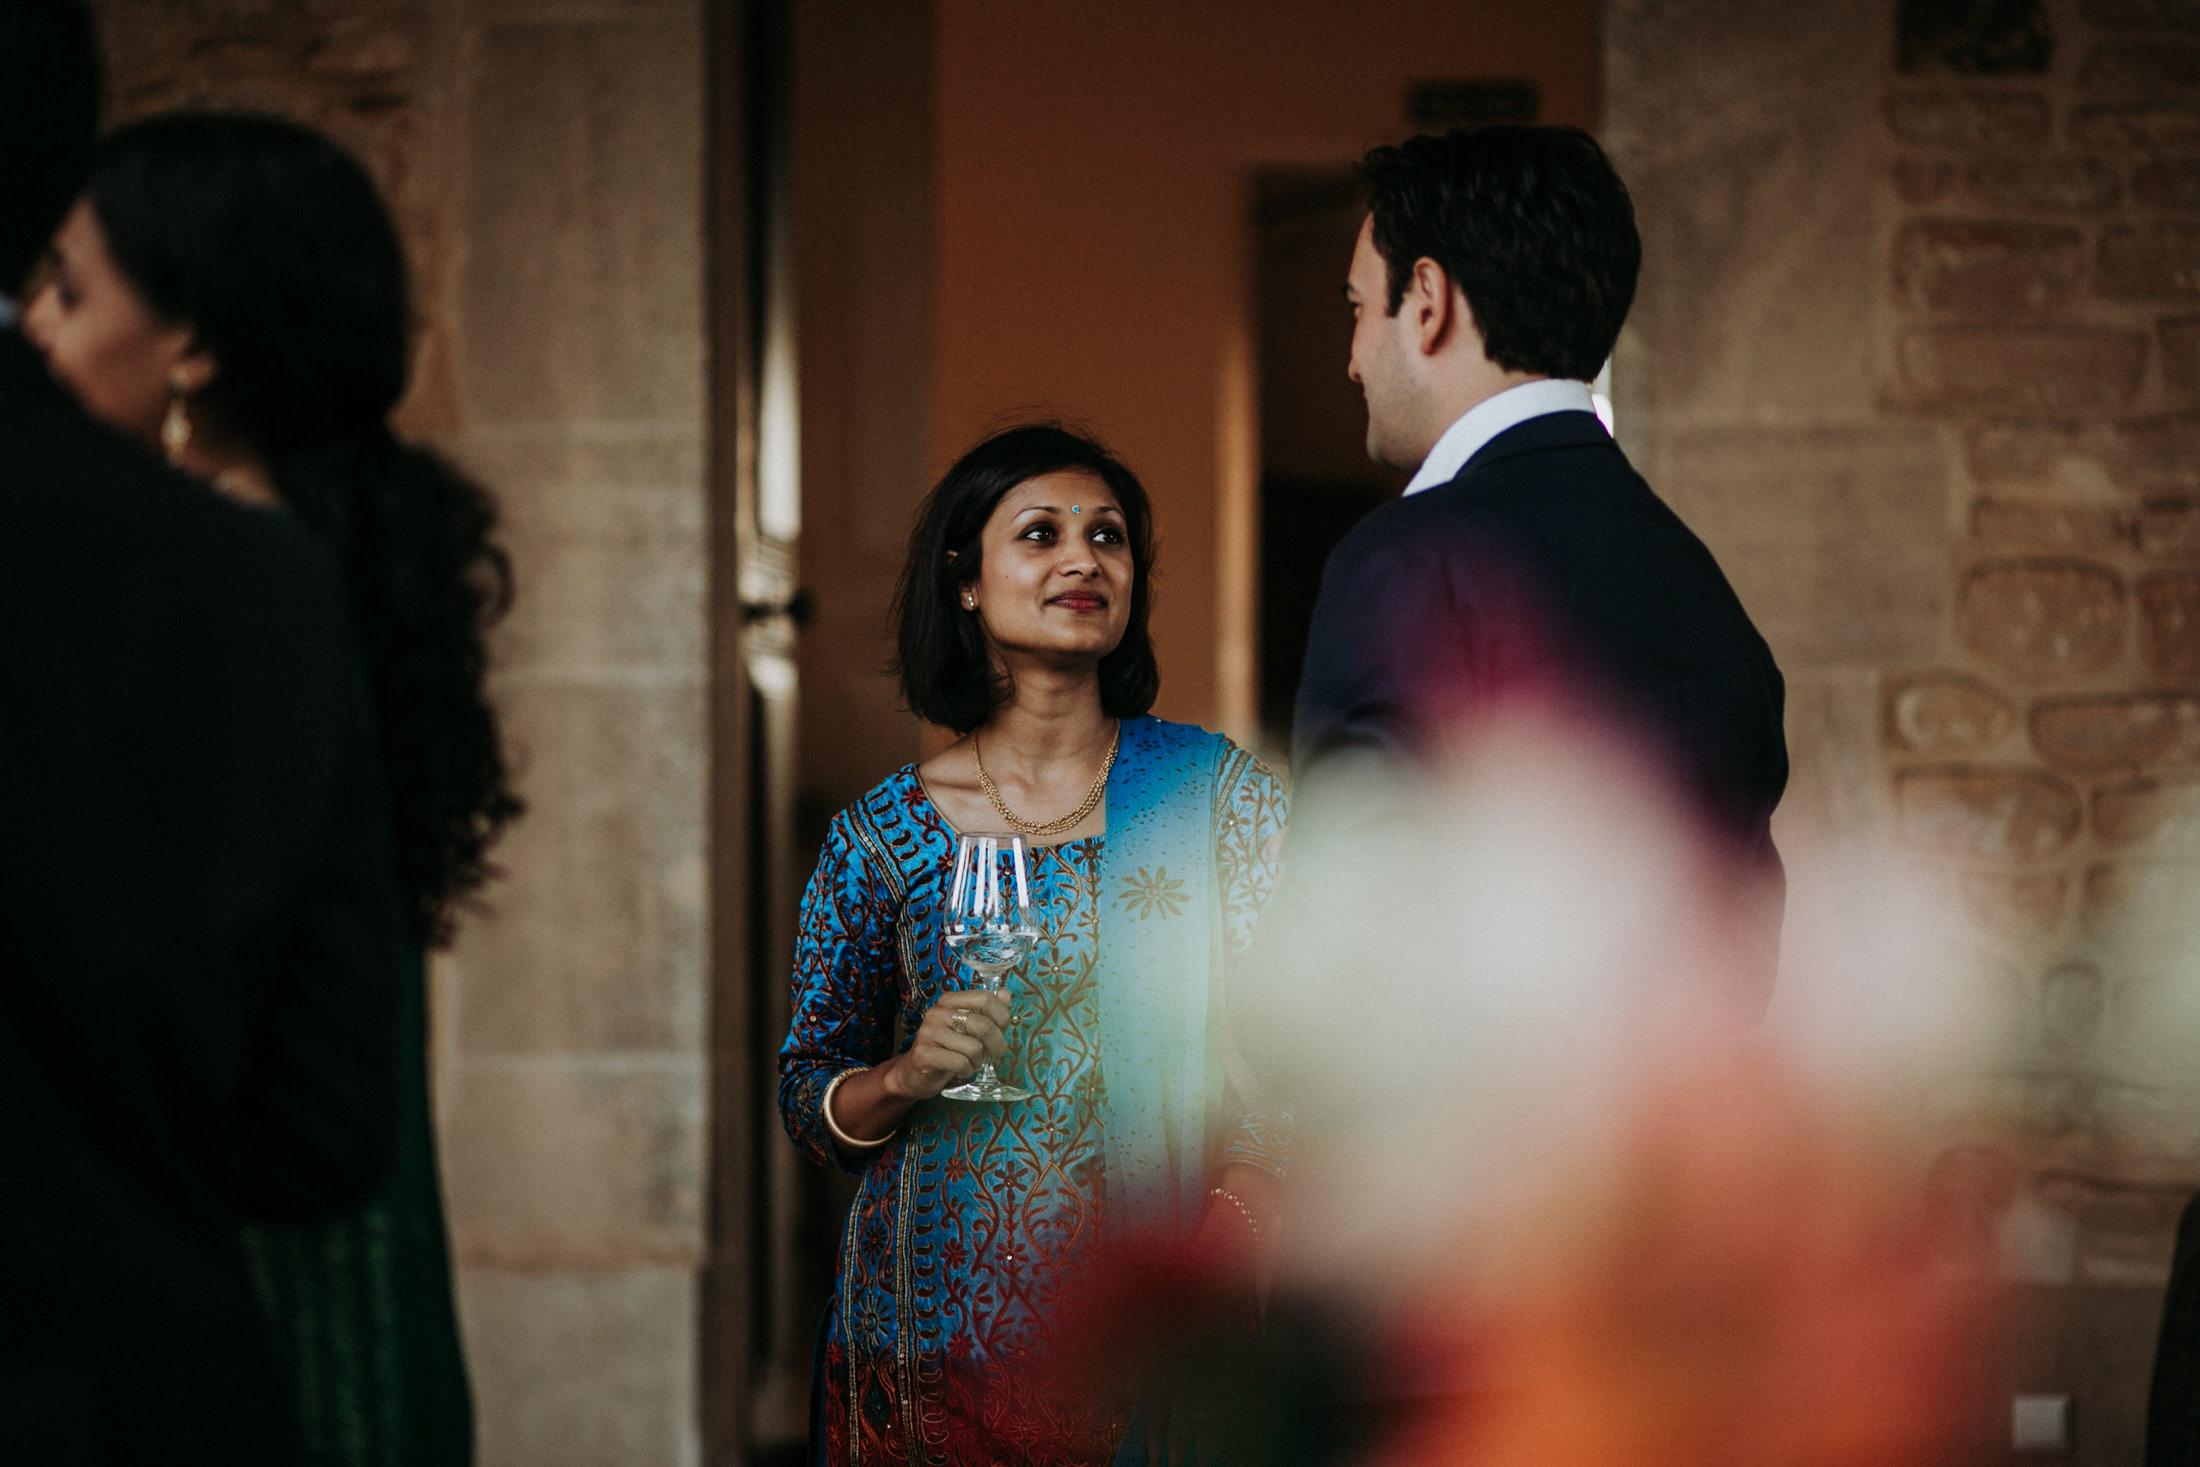 Wedding_Photographer_Mallorca_Daniela-Marquardt_Photography_New_York_Iceland_Tuscany_Santorini_Portugal_Austria_Bavaria_Elopement_Hochzeitsfotograf_AntjeRajat1_47